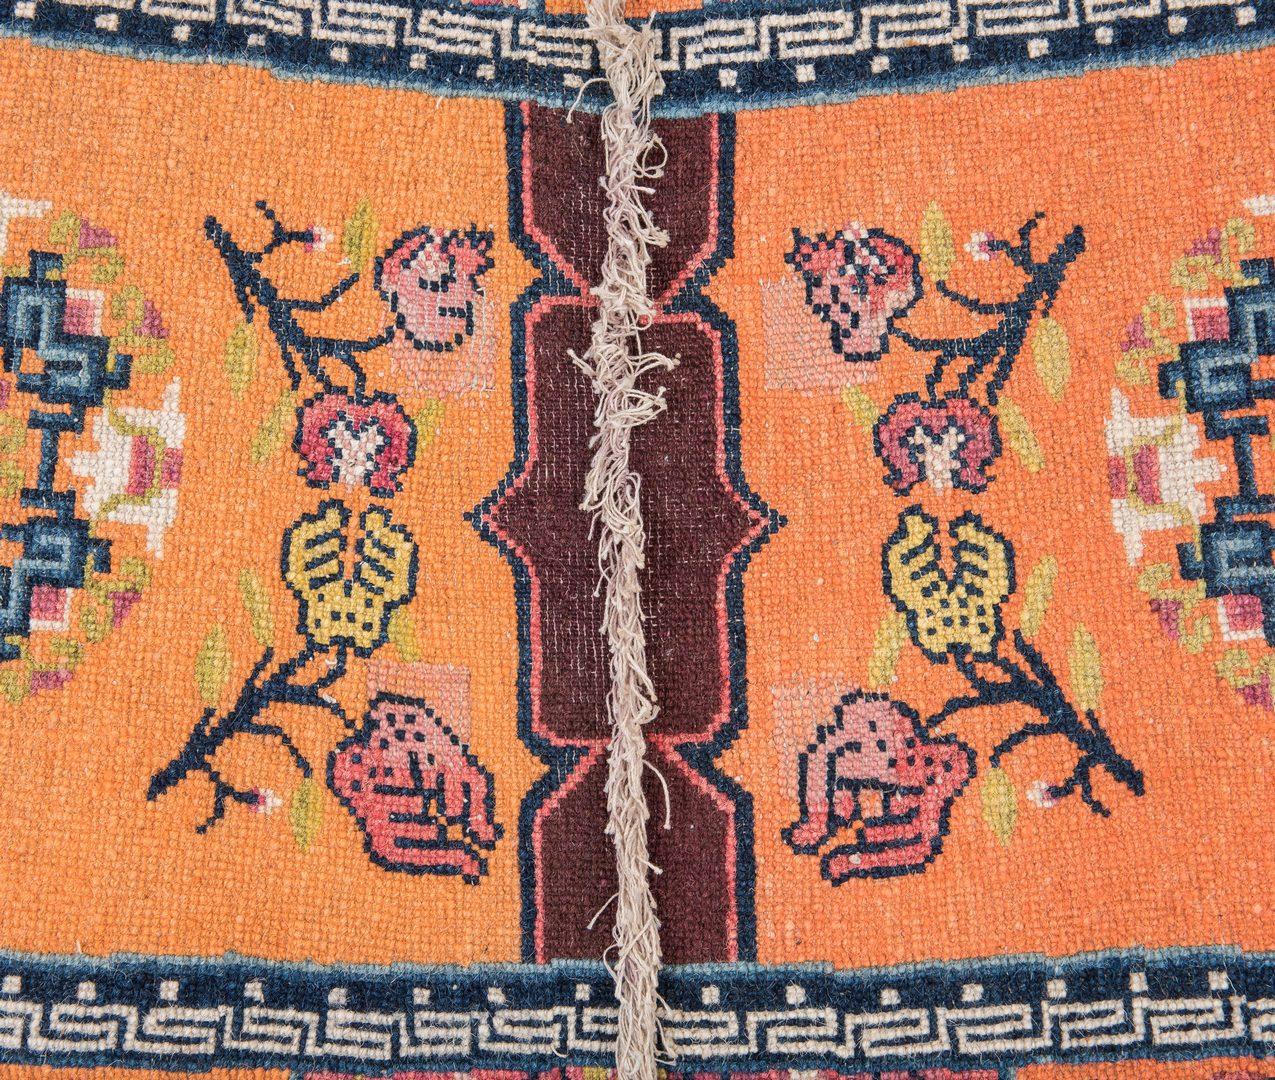 Lot 204: Mongolian Saddle Rug, 1st quarter 20th c.